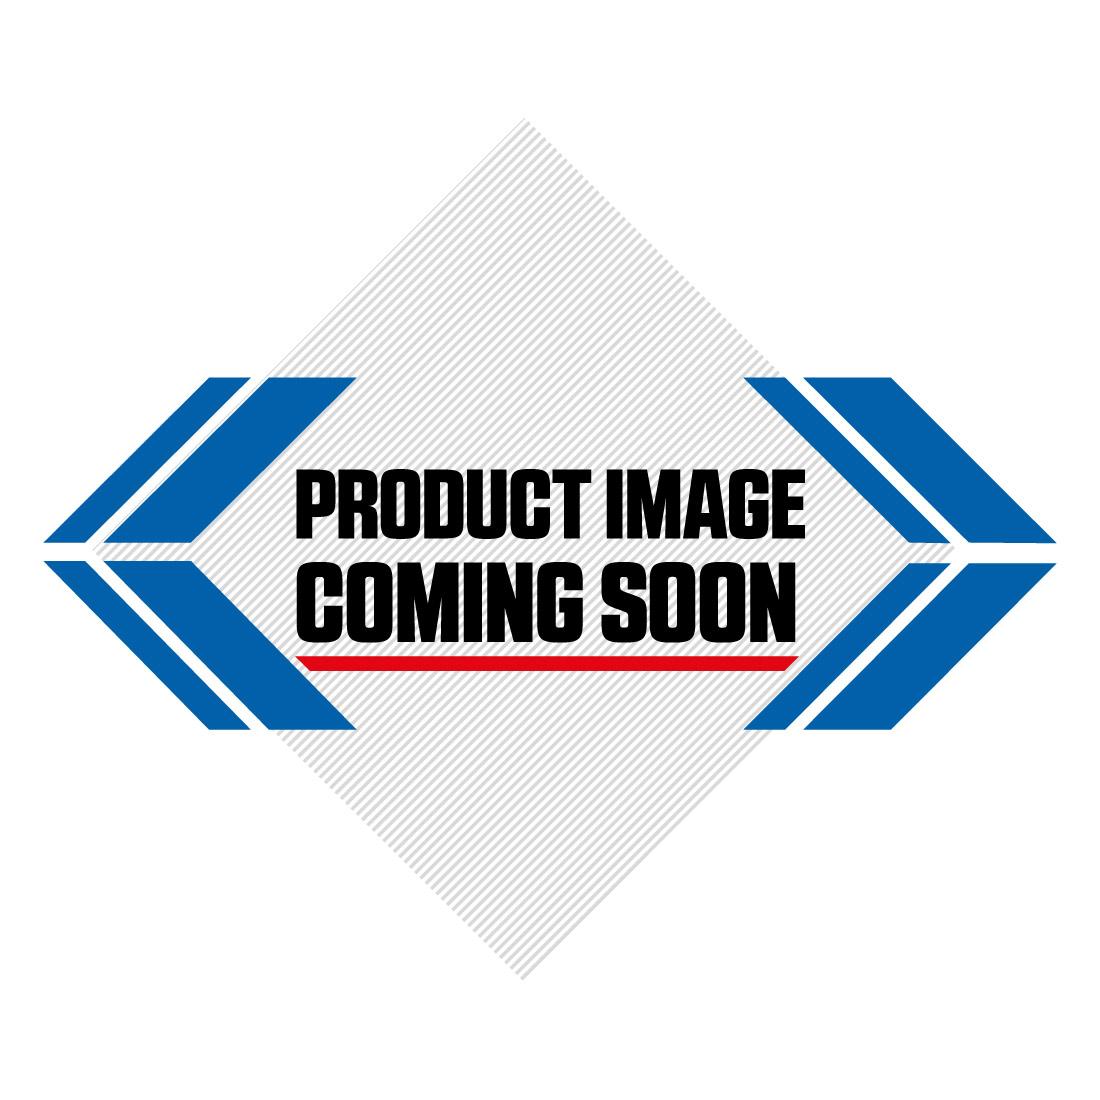 Suzuki Restyled Plastic Kit  RM 85 (00-20) RM Yellow 01-on Image-1>